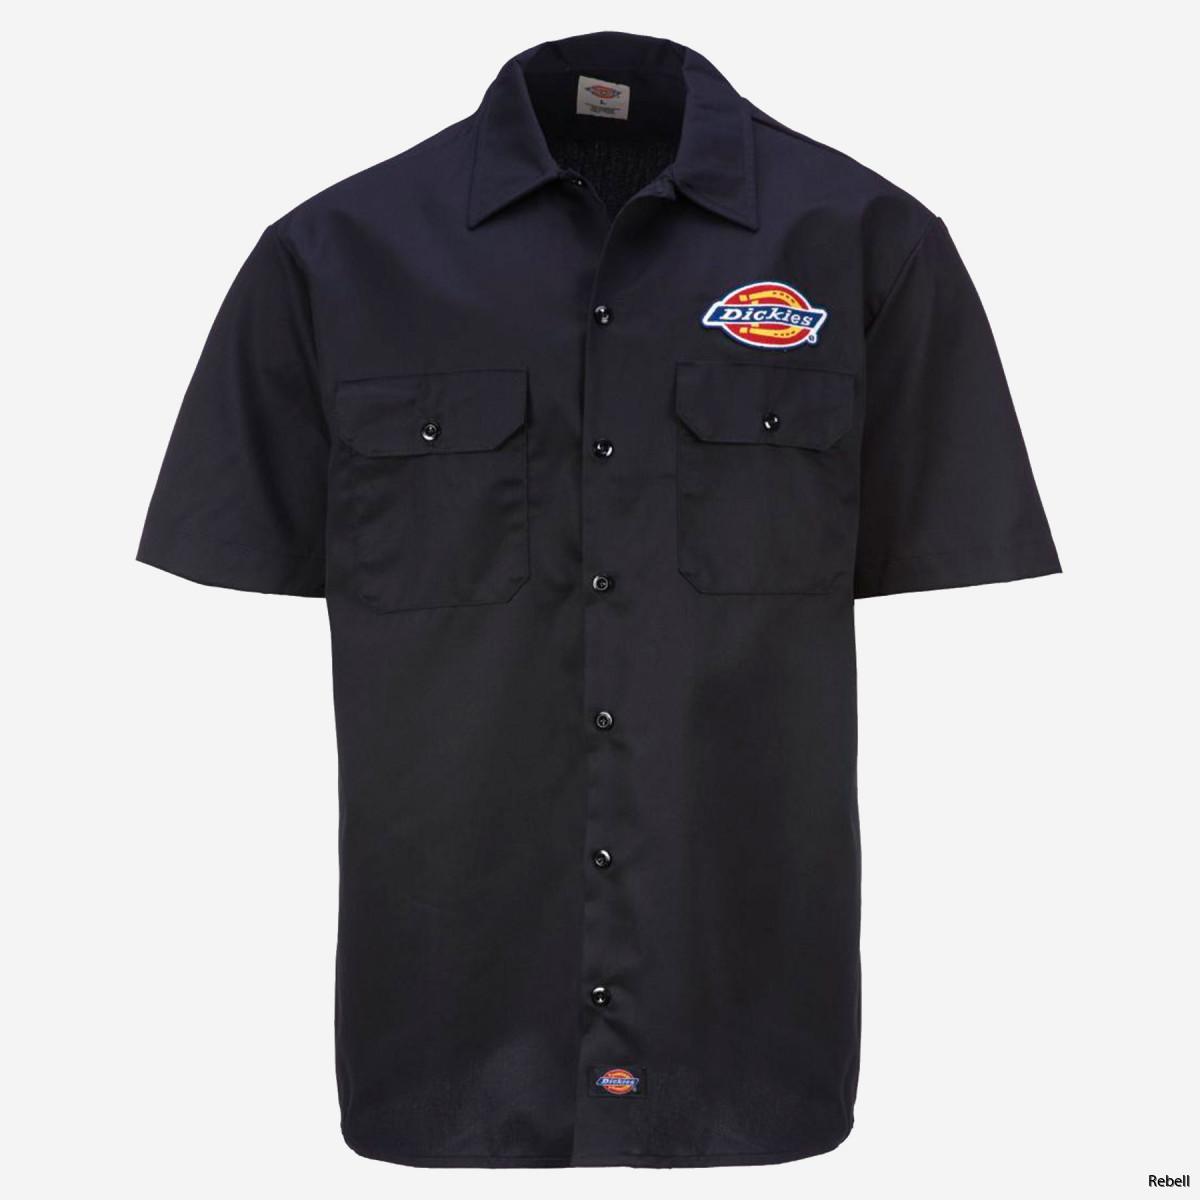 clintondale dickies dickies skjorta rebell rebellclothes attityd rock rockabilly